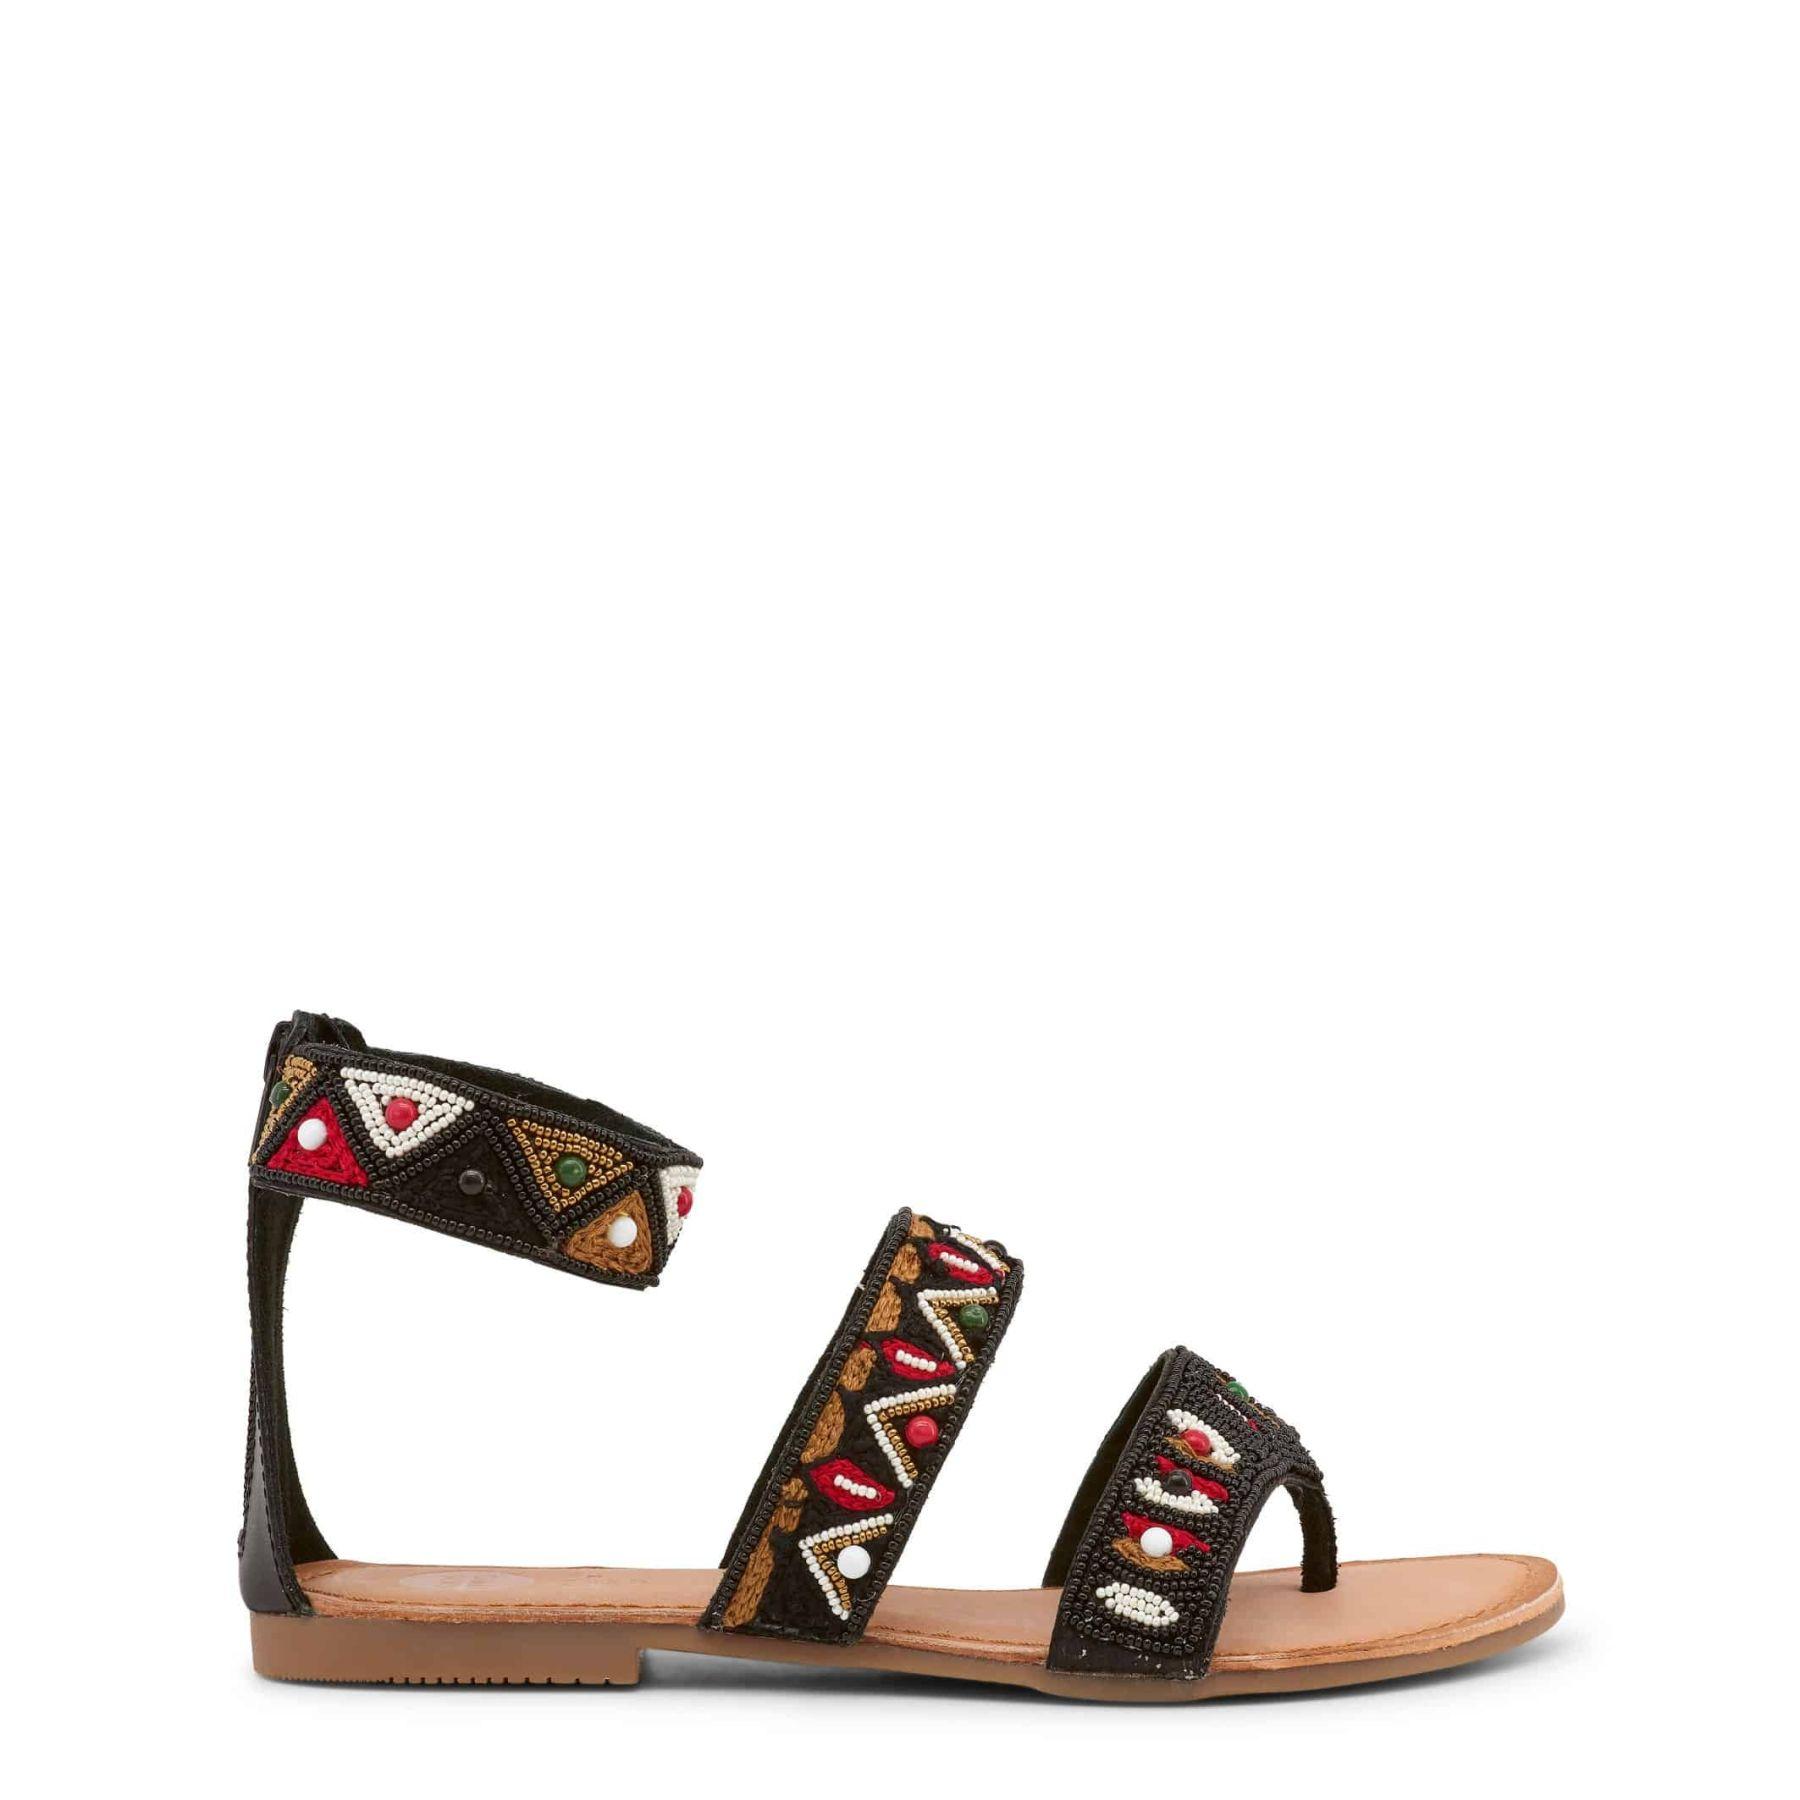 Gioseppo - FLORINTA - Negro Sandalias de mujer, calzado de verano, chanclas